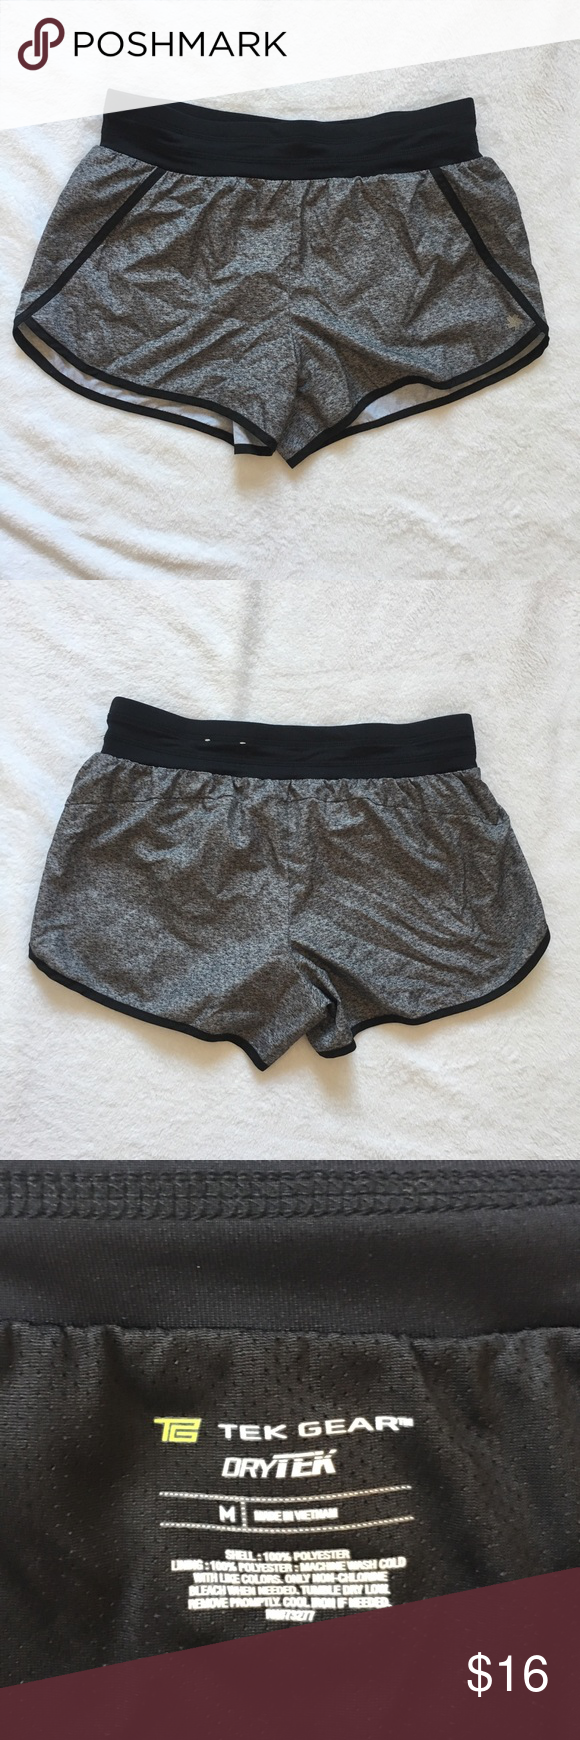 Tek Gear Womens Shorts Black Sz L Mid Rise Workout Athletic Running Dry Tek New